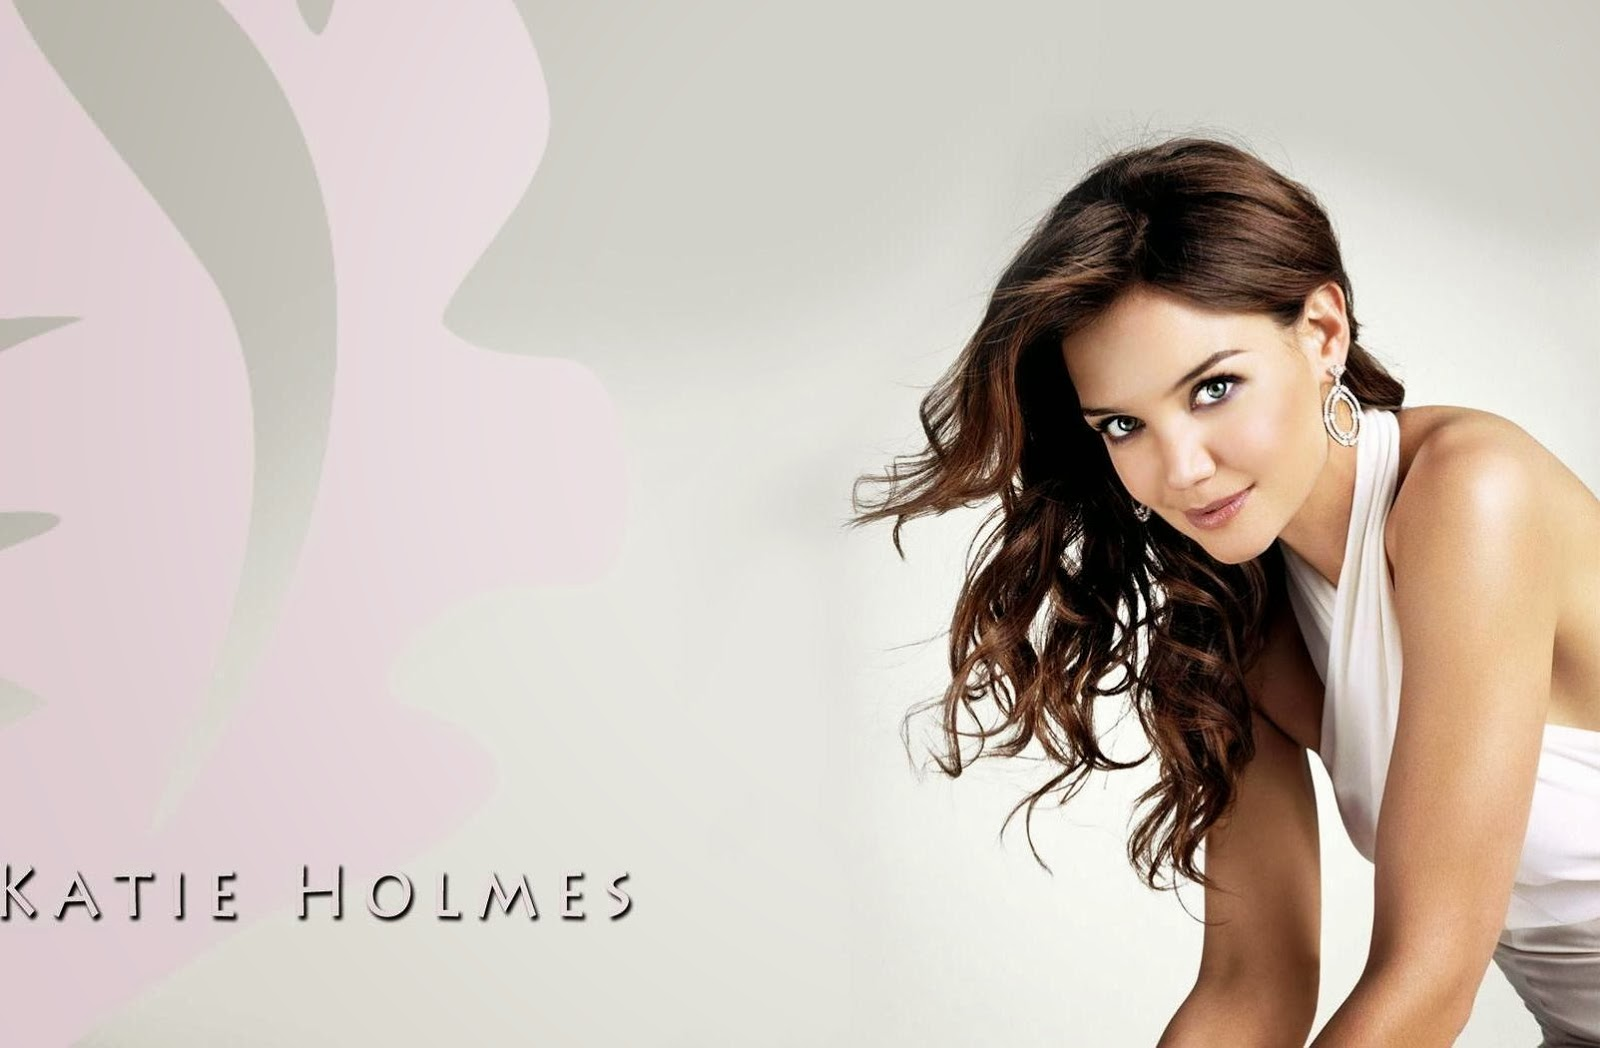 Katie Holmes HD Wallpaper